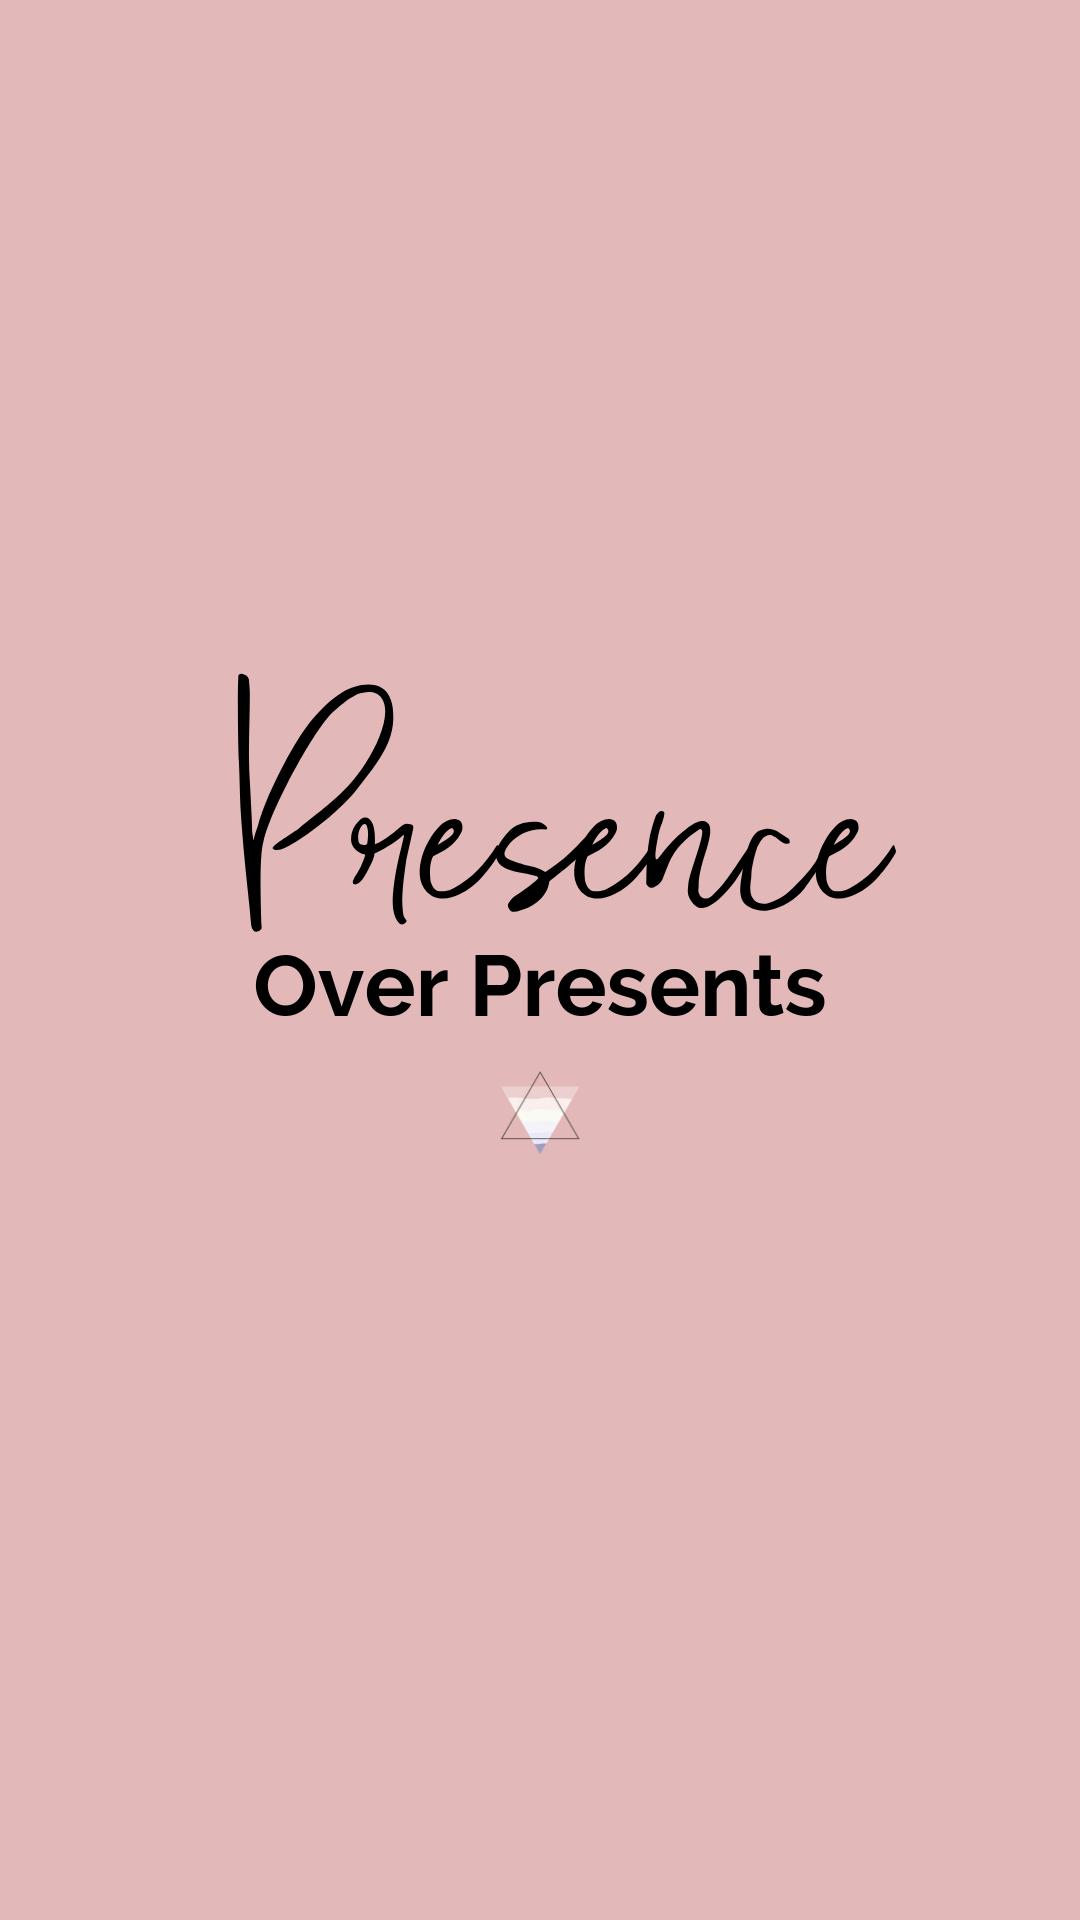 Presence over Presents - IG .png